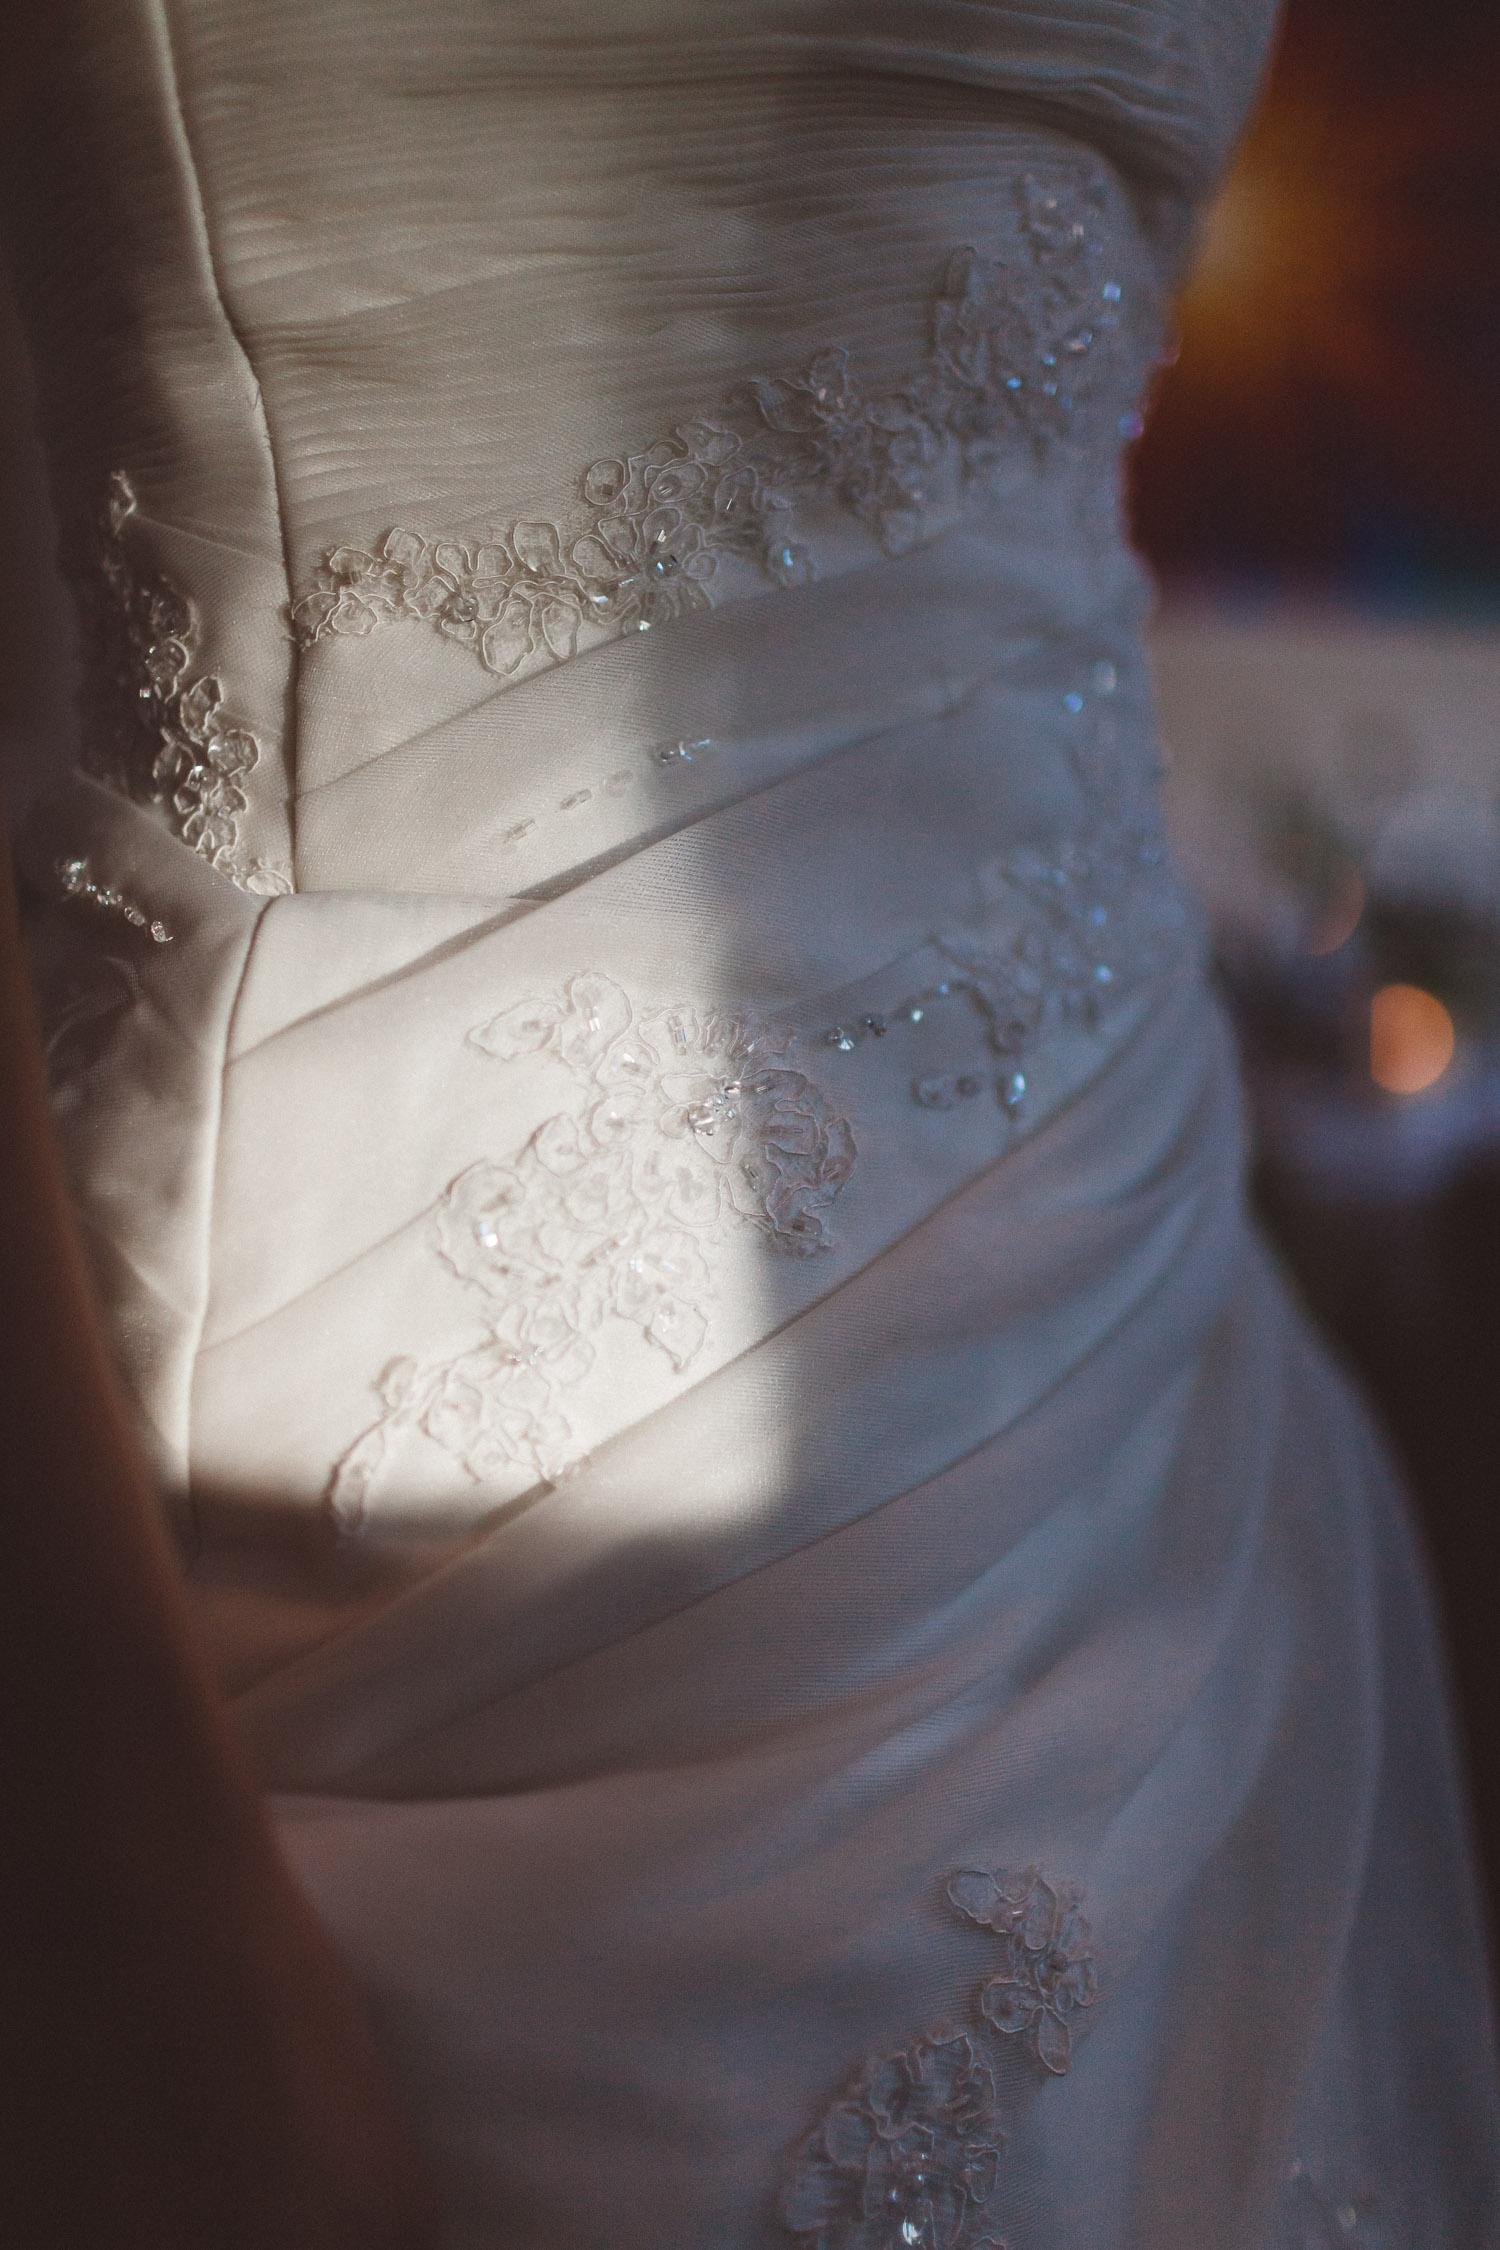 Wedding-huwelijk-trouwen-bruiloft-photography-fotografie-fotograaf-photographer-Rijksmuseum-College-Hotel-On-a-hazy-morning-Amsterdam-The-Netherlands-70.jpg